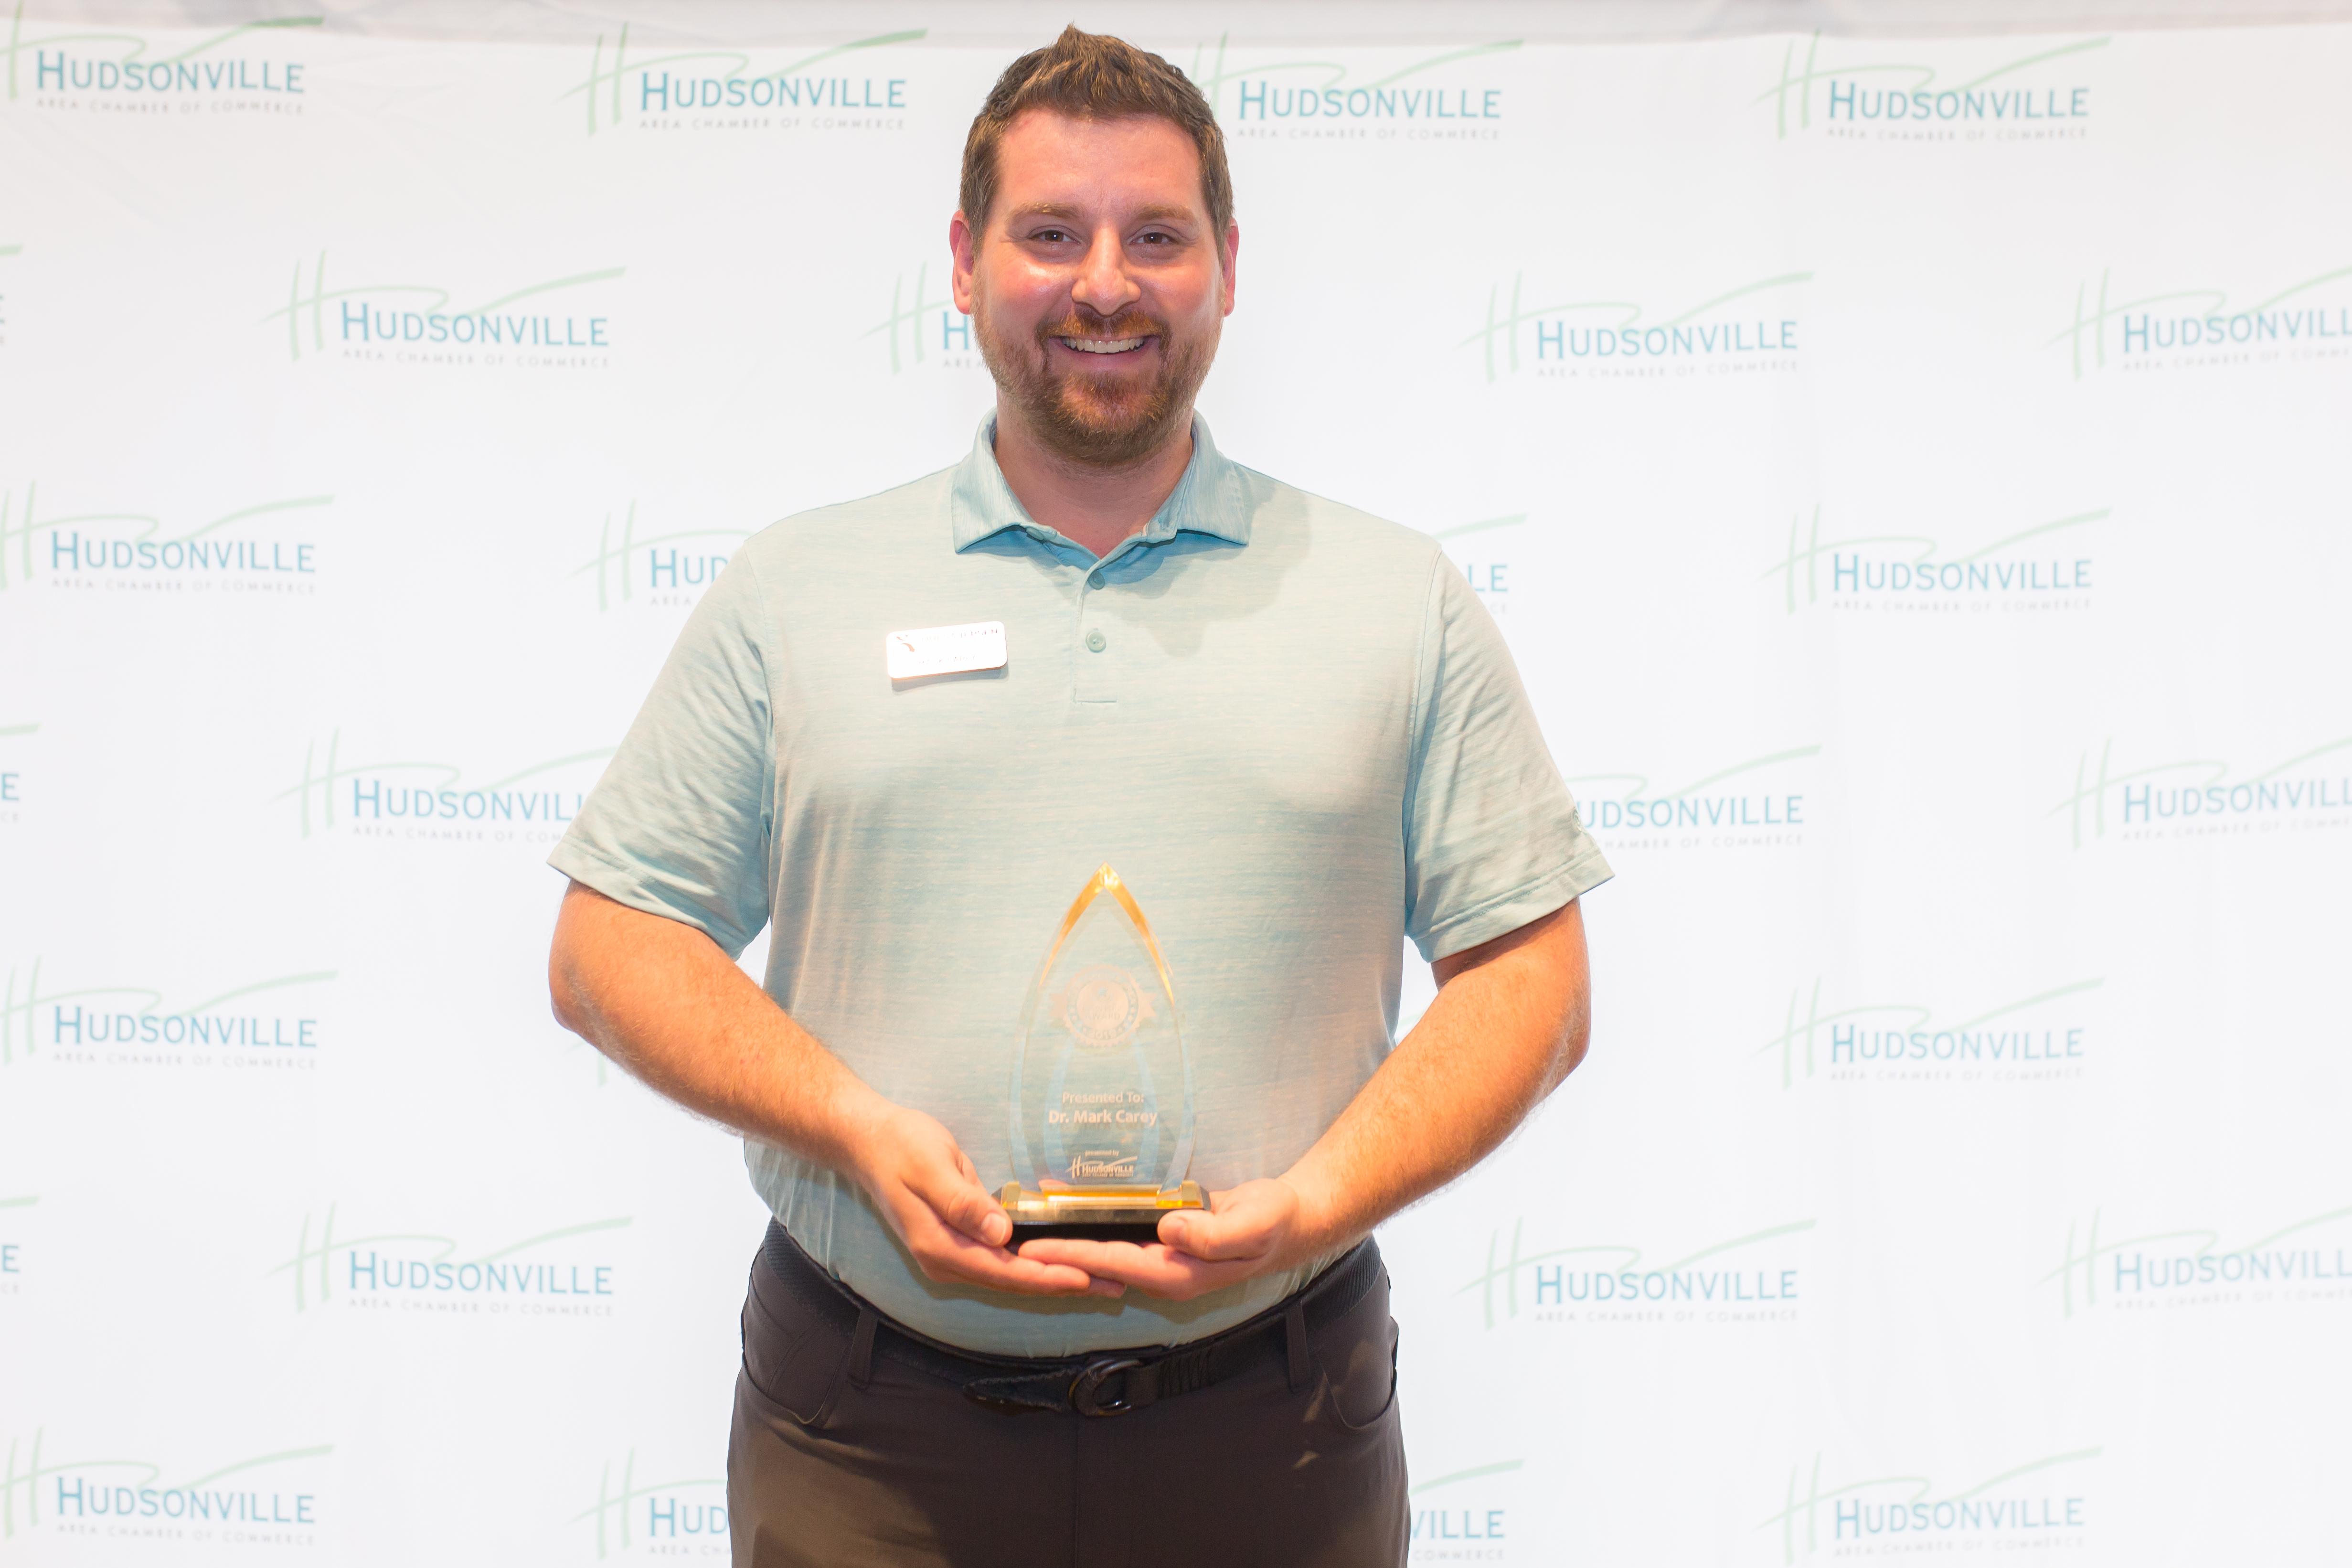 Hudsonville Area Leadership Award 2019 - Dr. Mark Carey